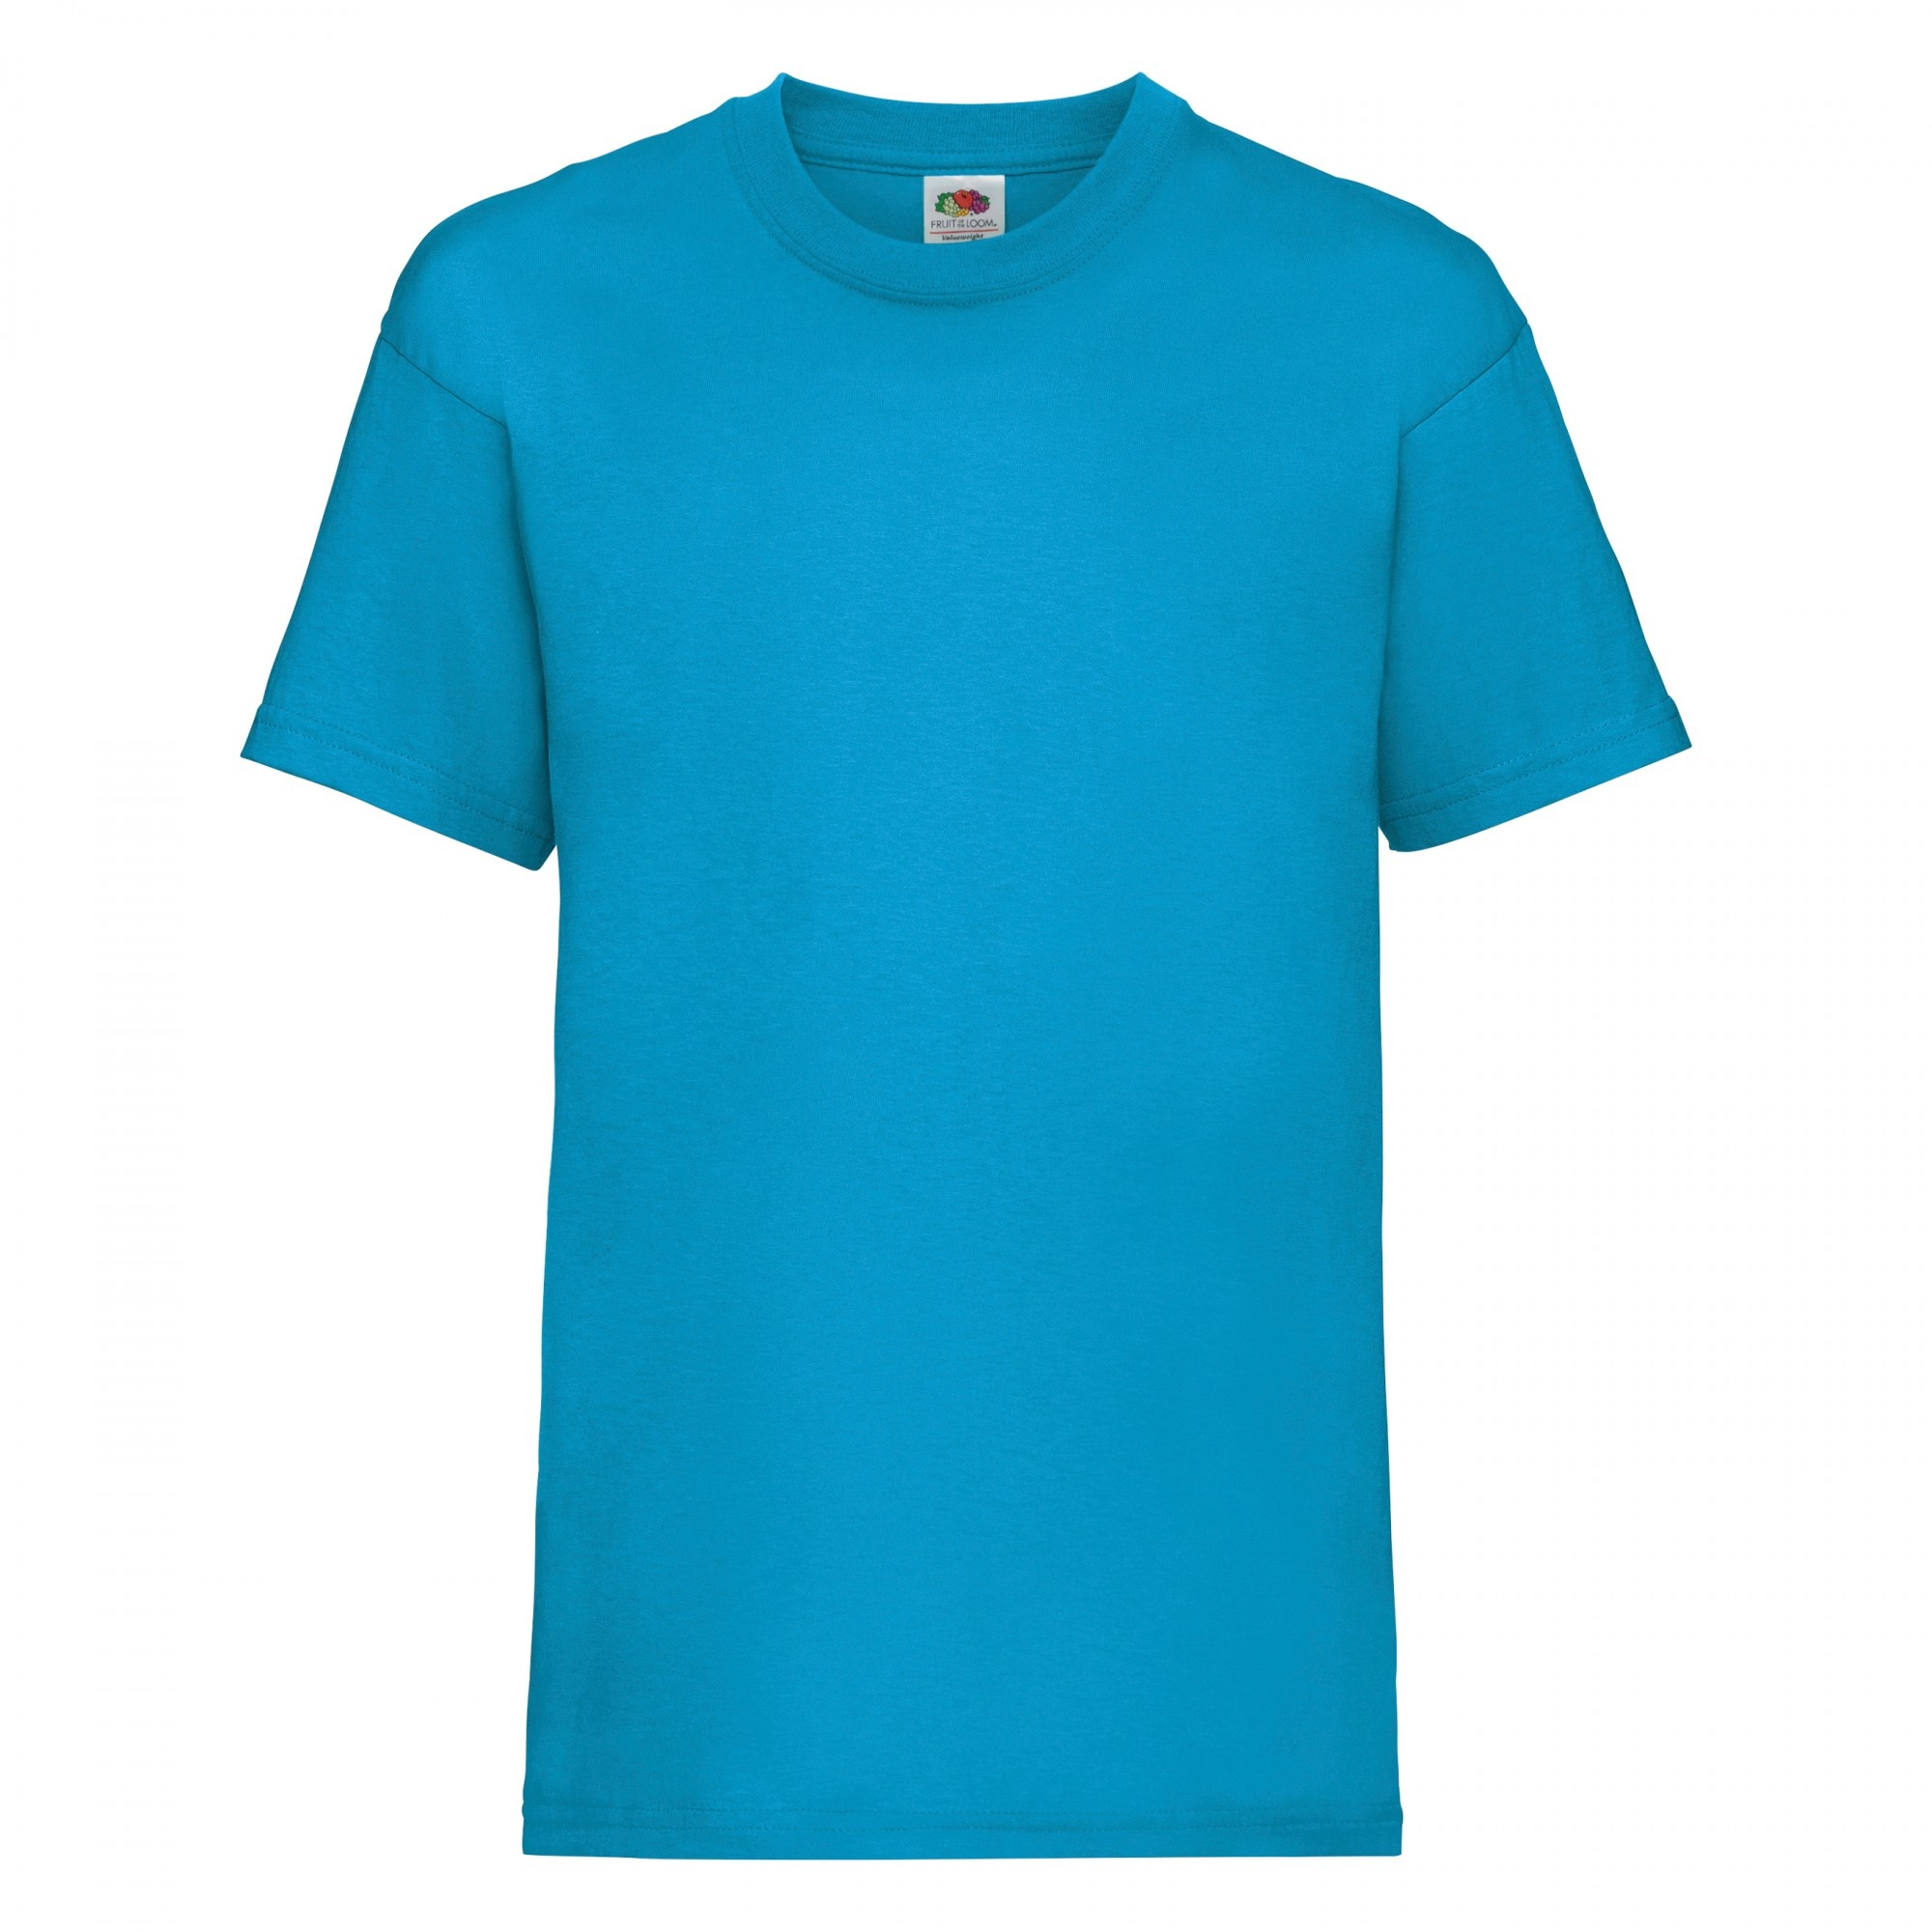 Fruit Of The Loom Childrens/Kids Unisex Valueweight Short Sleeve T-Shirt (5-6) (Azure Blue)